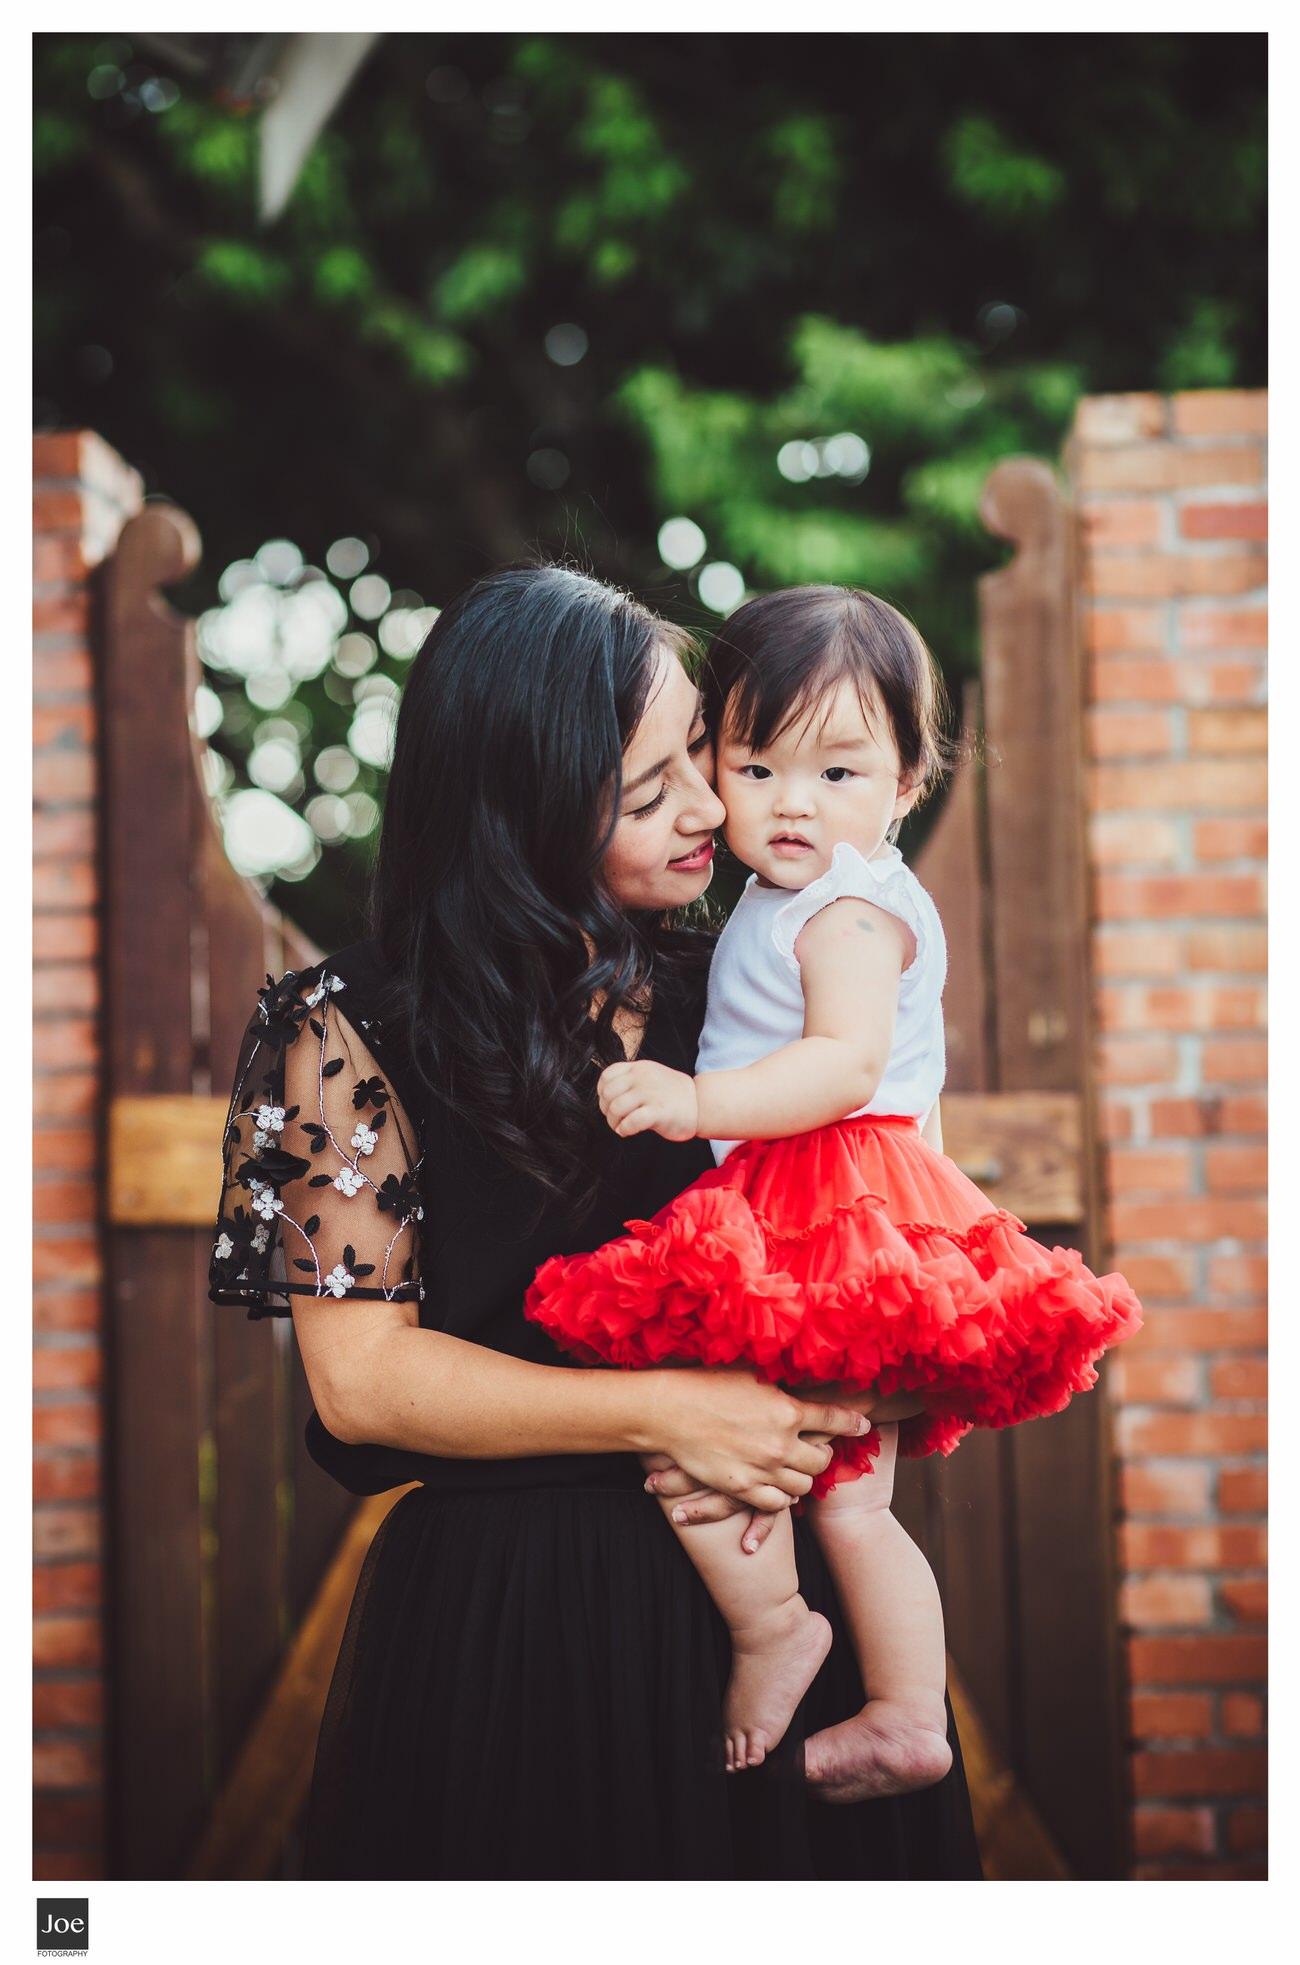 joe-fotography-family-photo-pepper-salt-bowtie-024.jpg